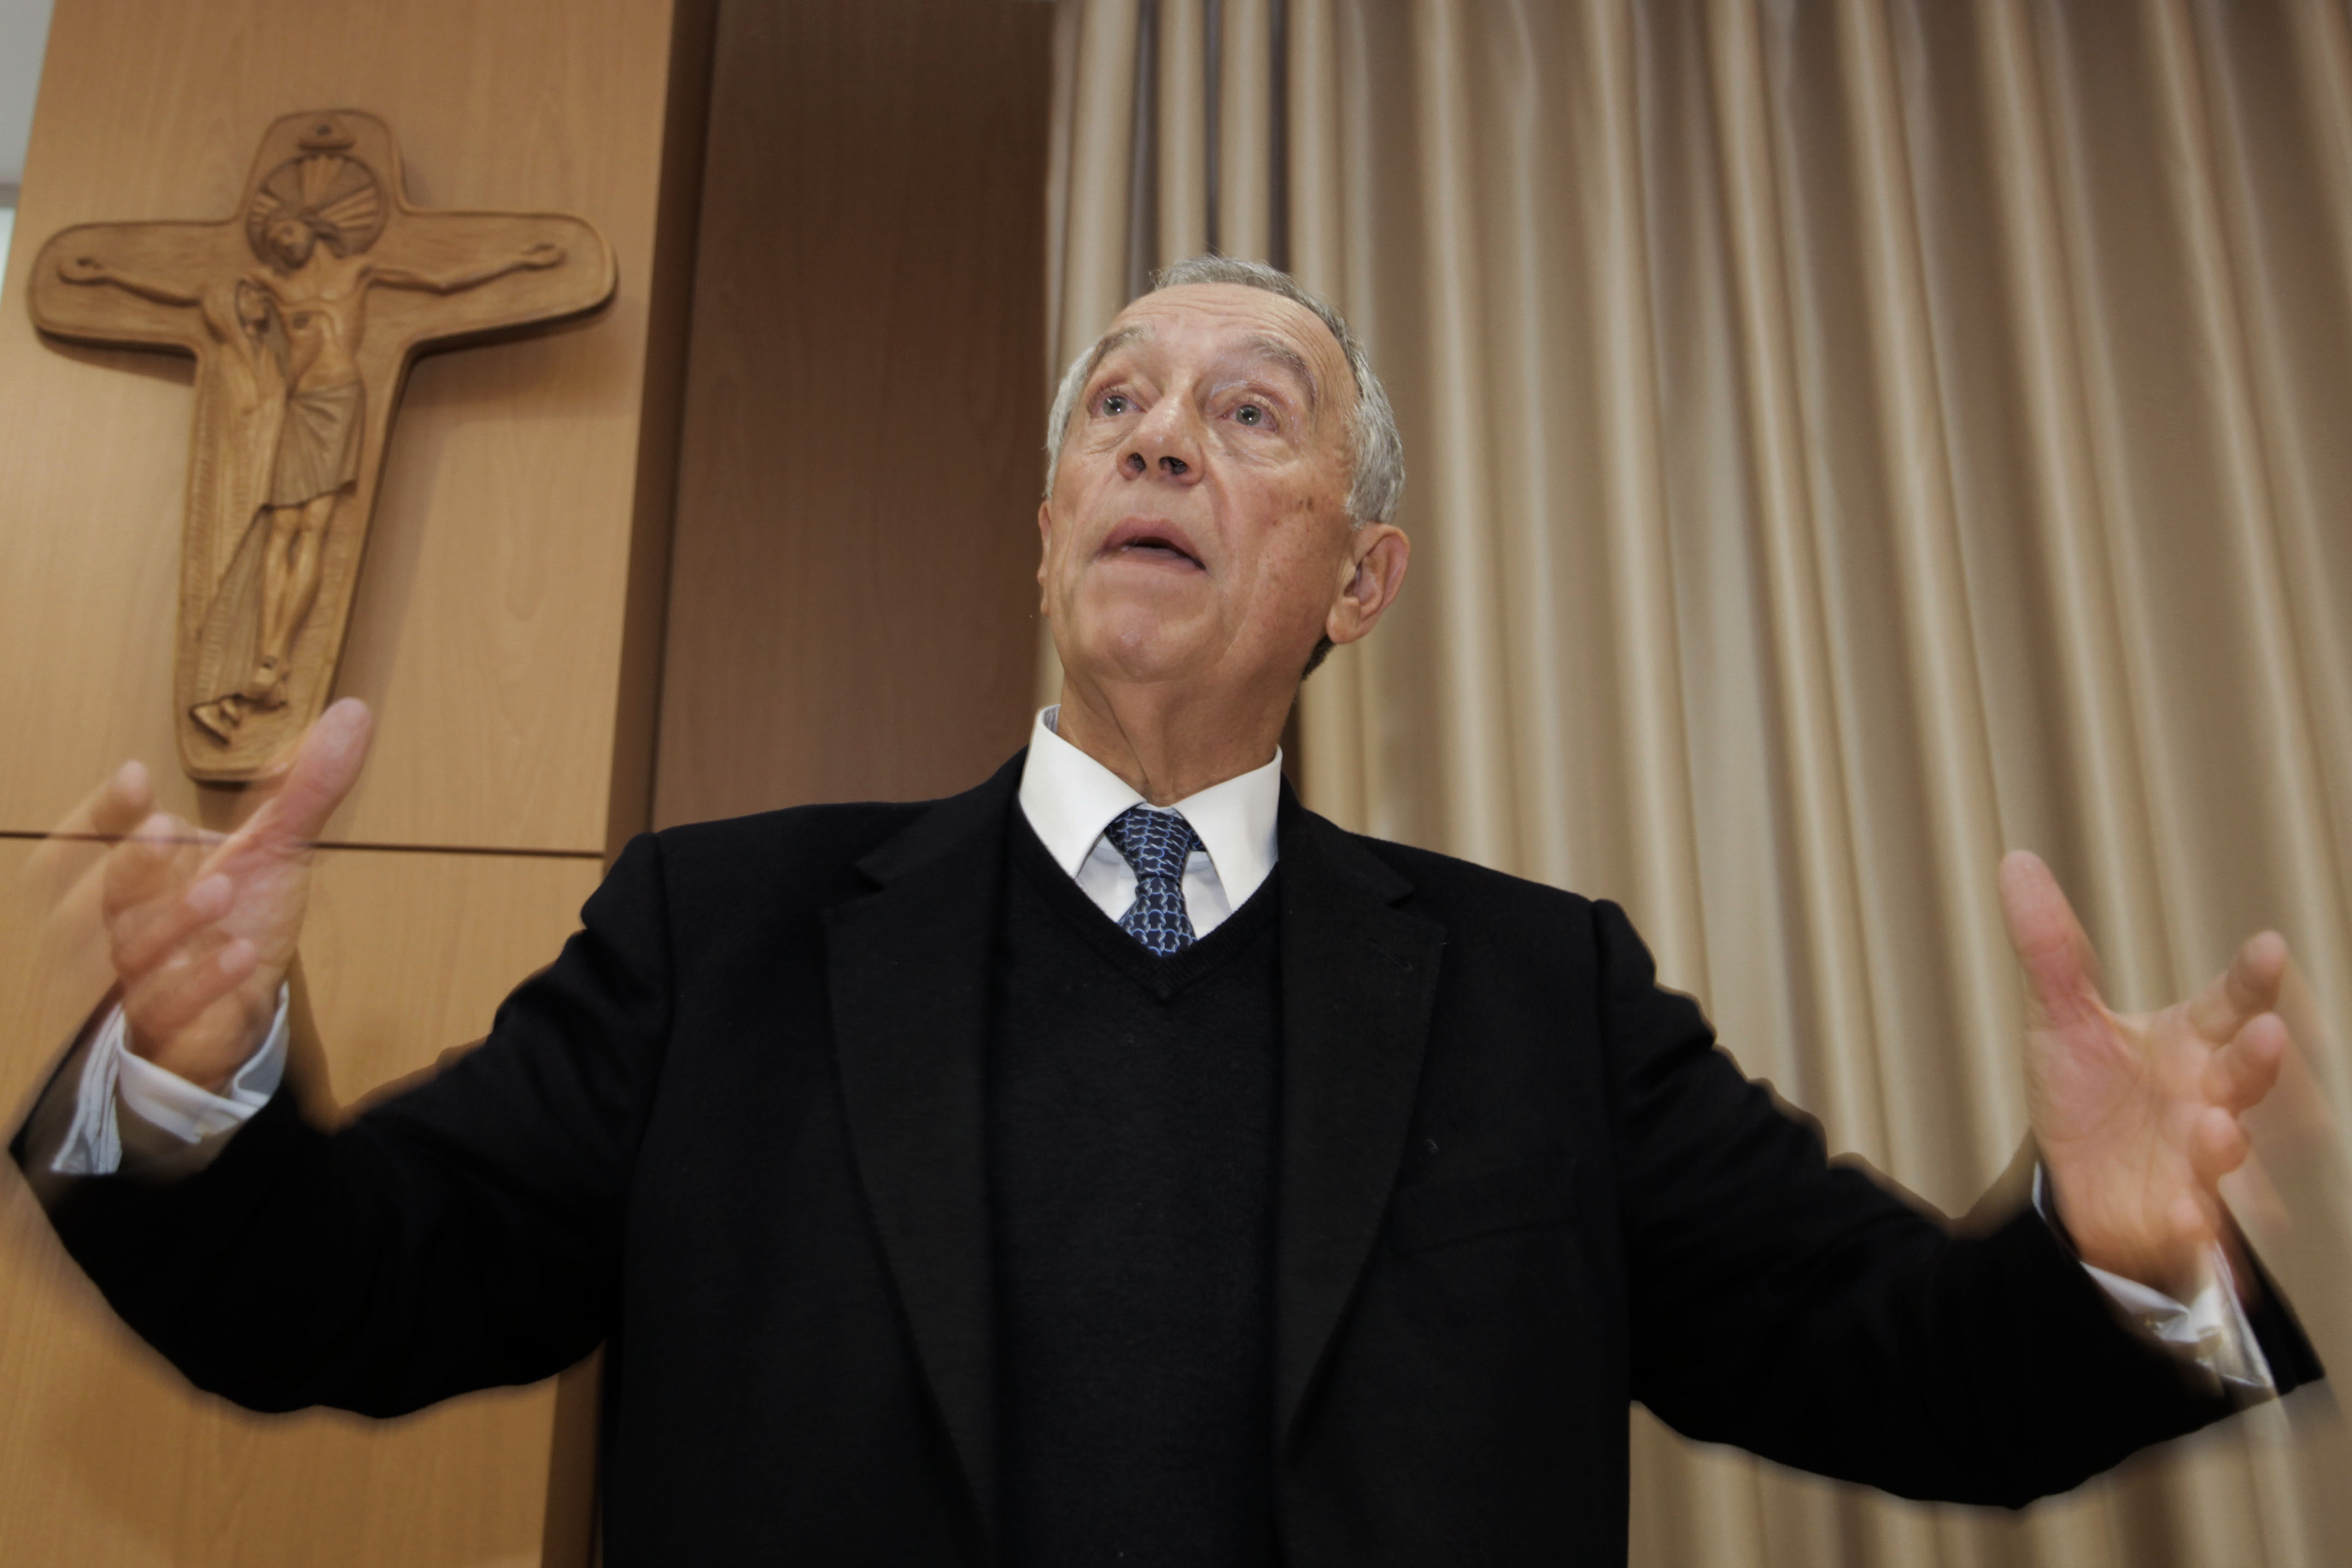 c29aba4d7 O candidato presidencial Marcelo Rebelo de Sousa disse hoje, em Paris,